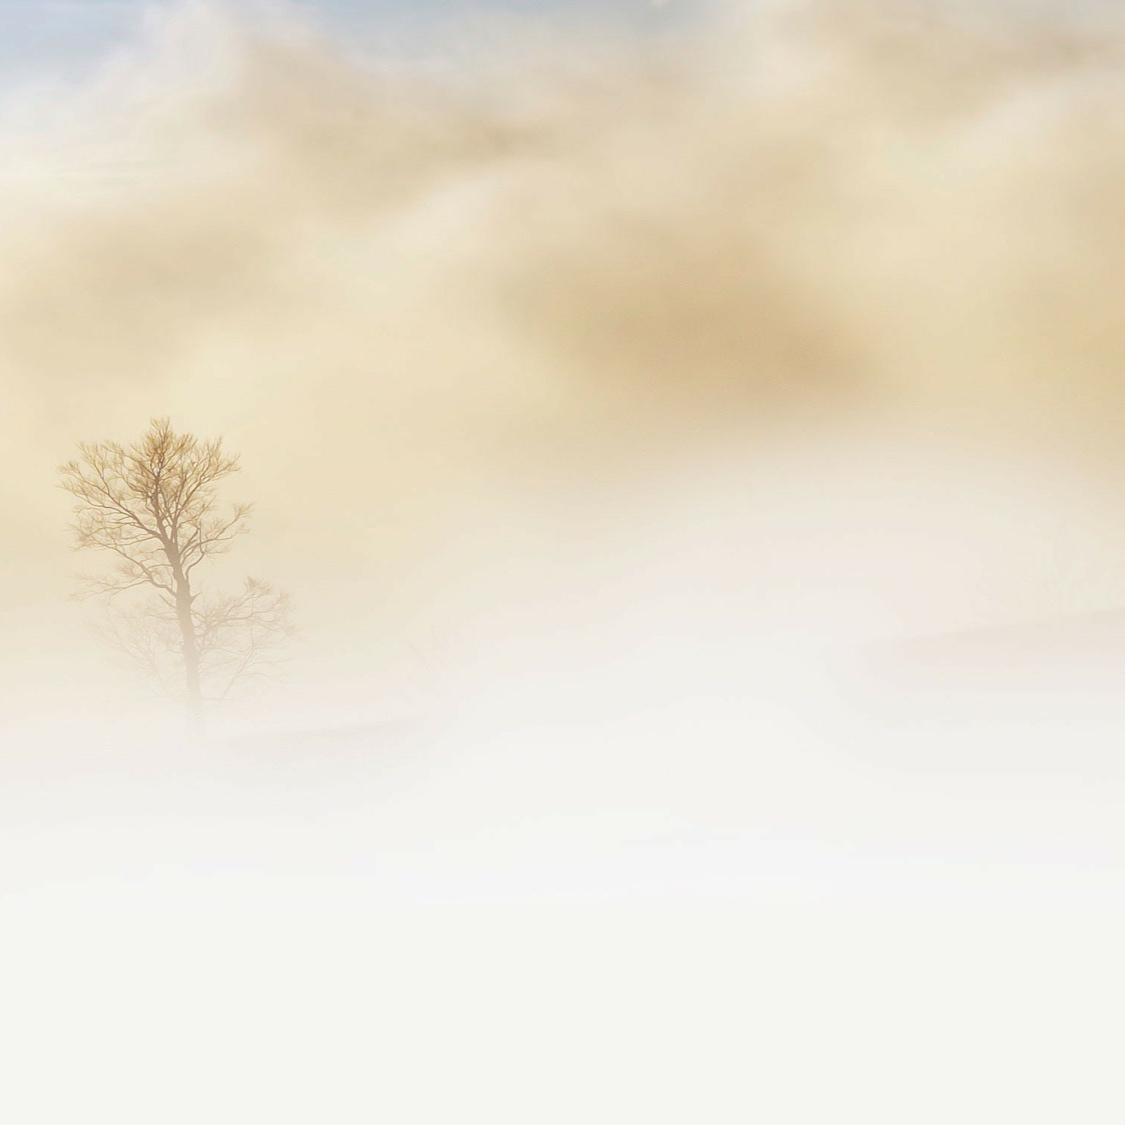 fog-240075_1920.jpg